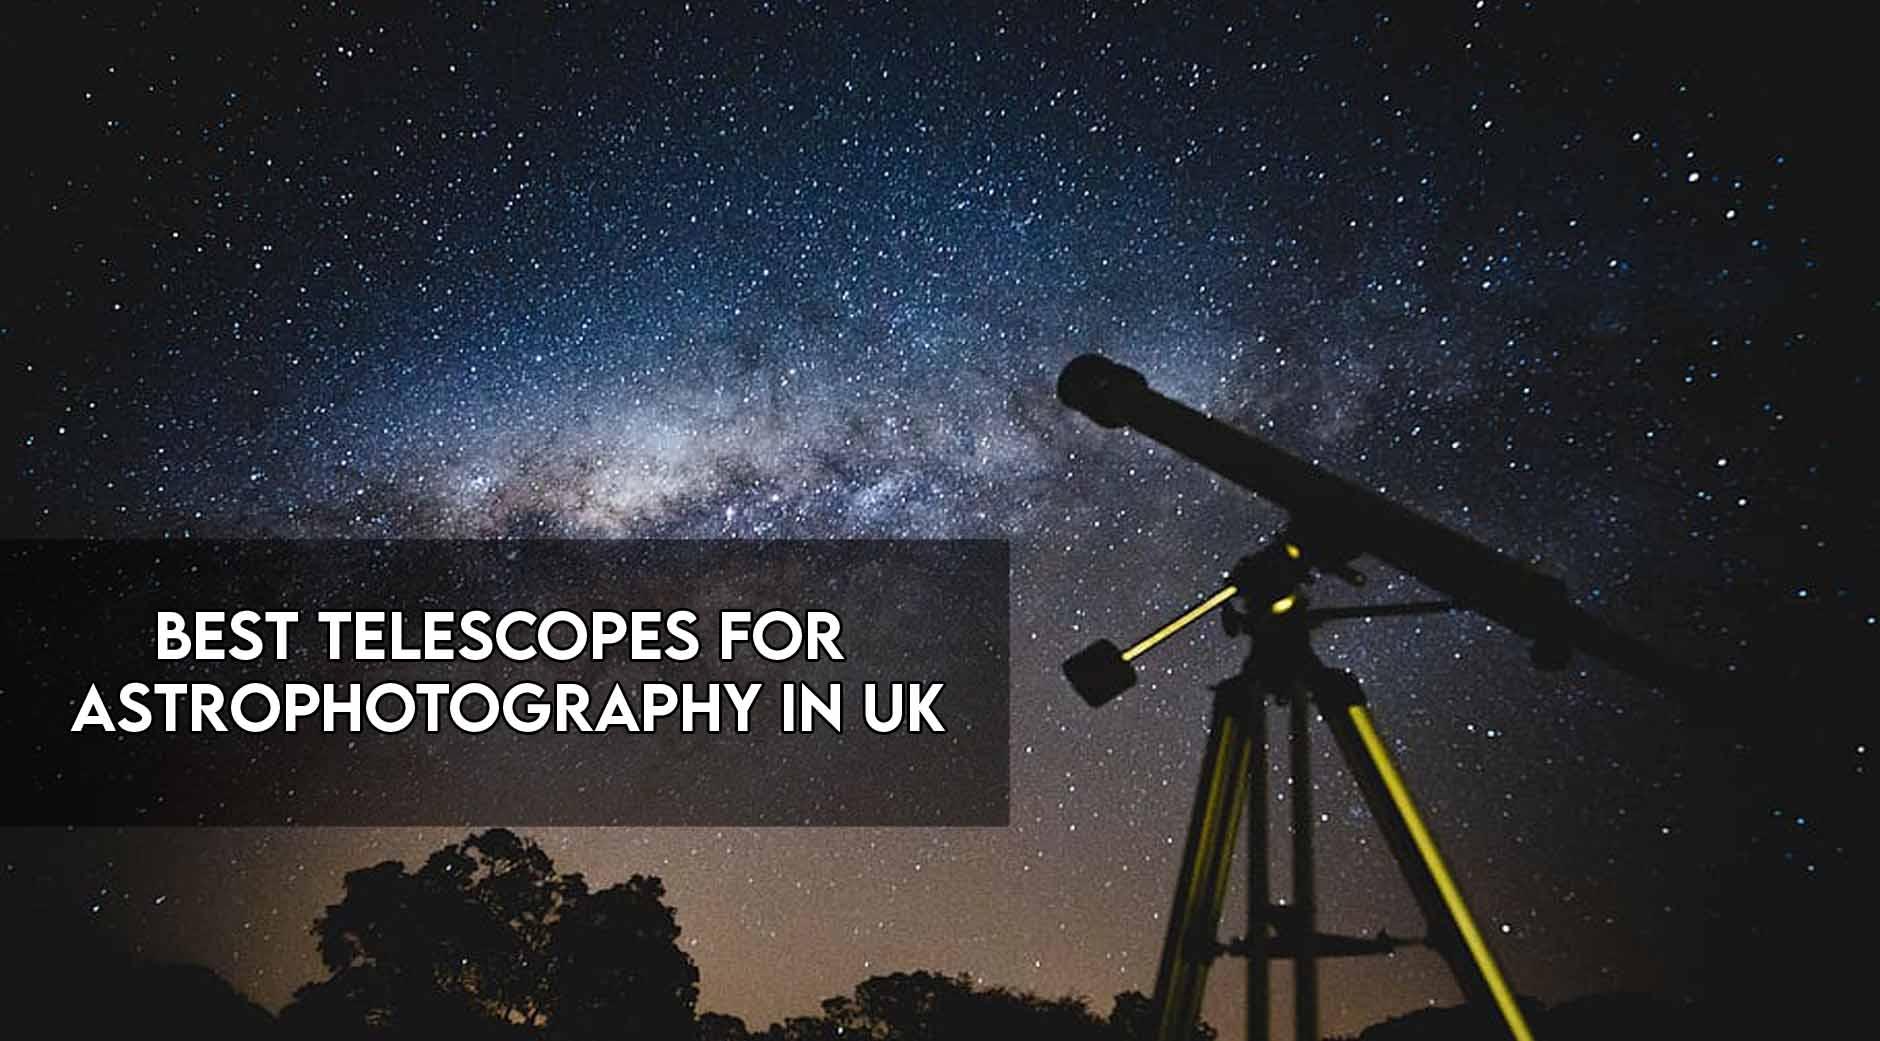 Telescope for Astronomy in UK